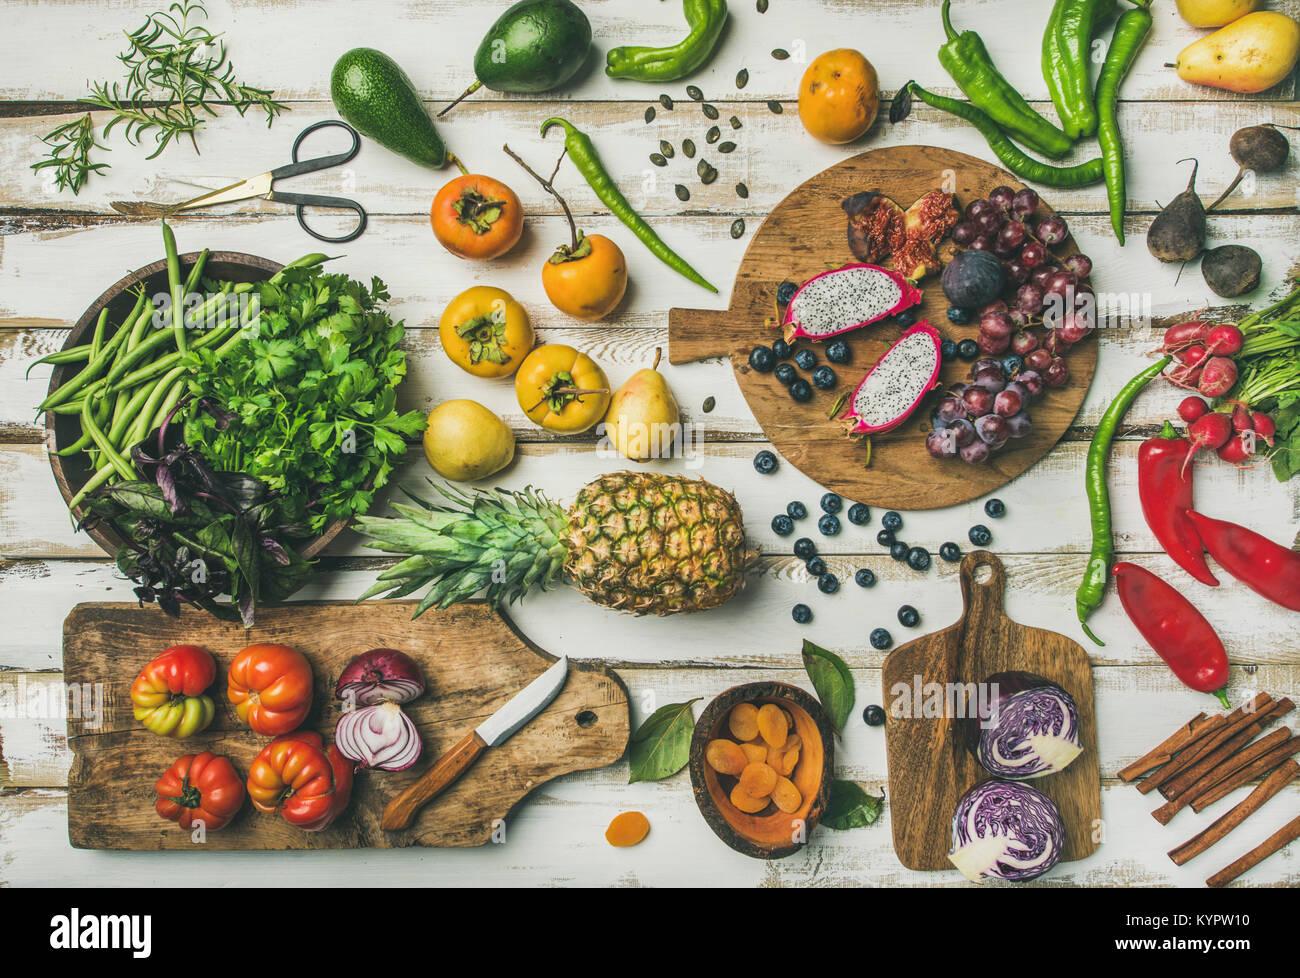 helathy fond cuisine vegan aliments crus t l vision jeter des fruits frais l gumes verts et. Black Bedroom Furniture Sets. Home Design Ideas